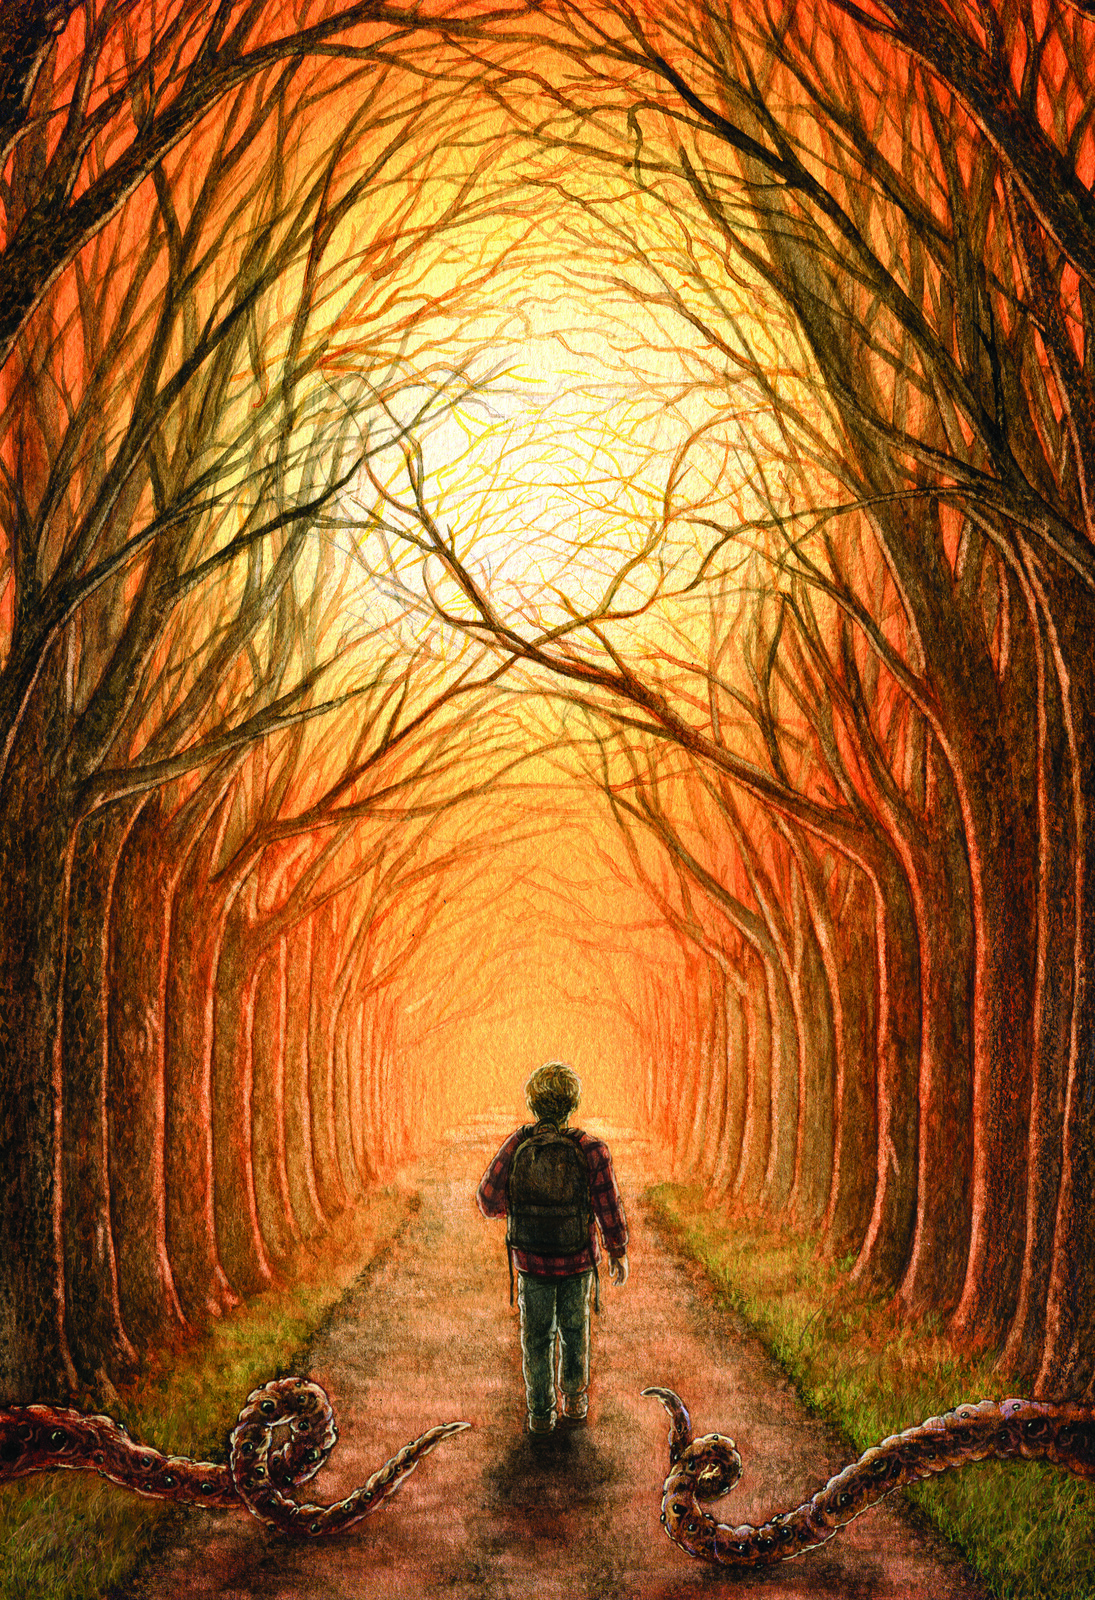 """Between Twilight & Dawn"" - unused cover"